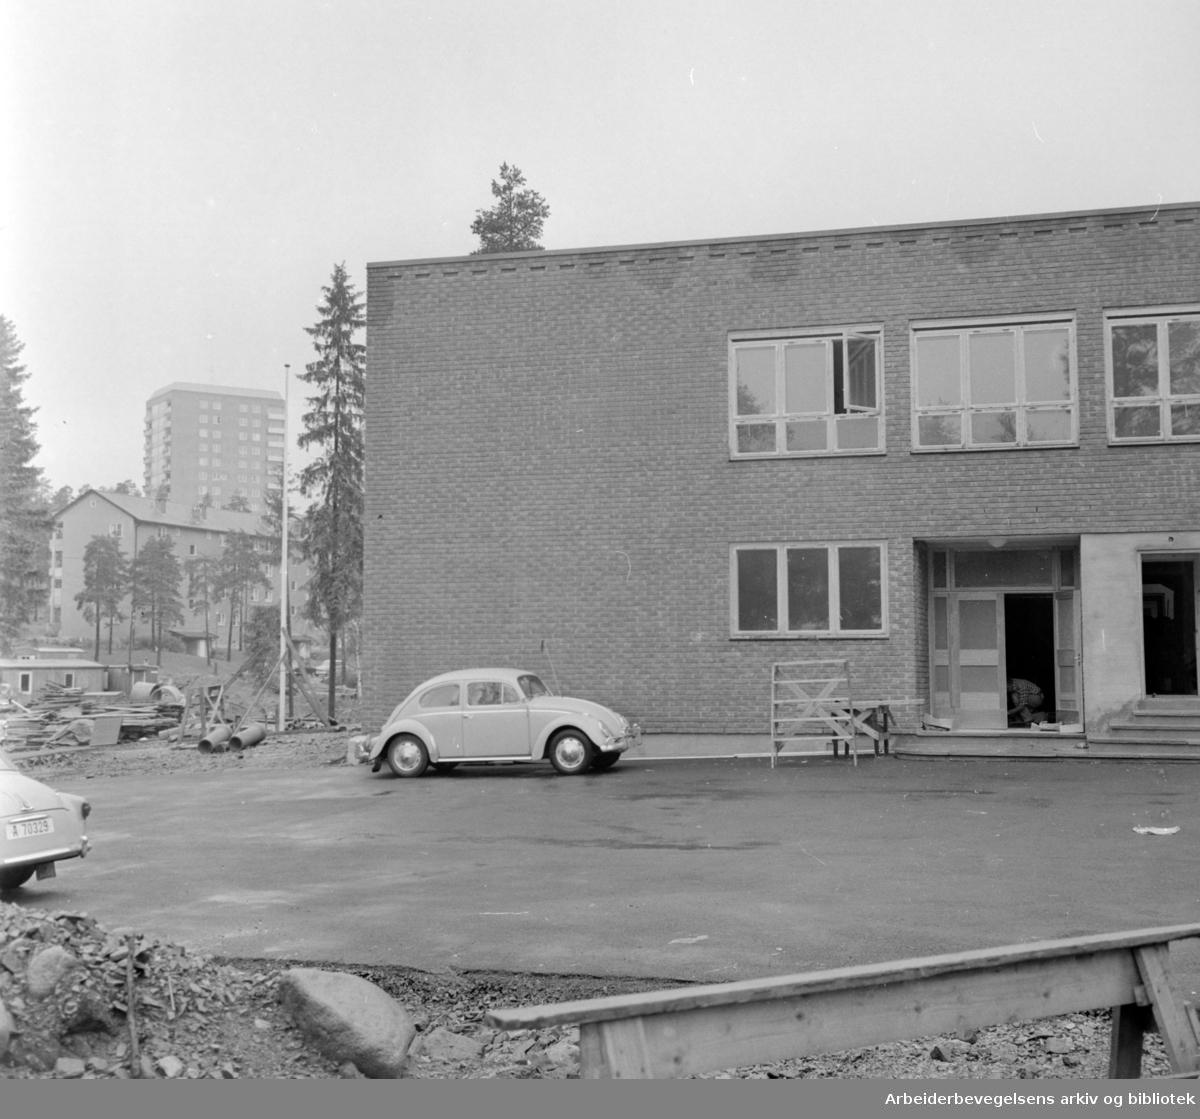 Tonsenhagen skole klar for 280 elever. August 1963